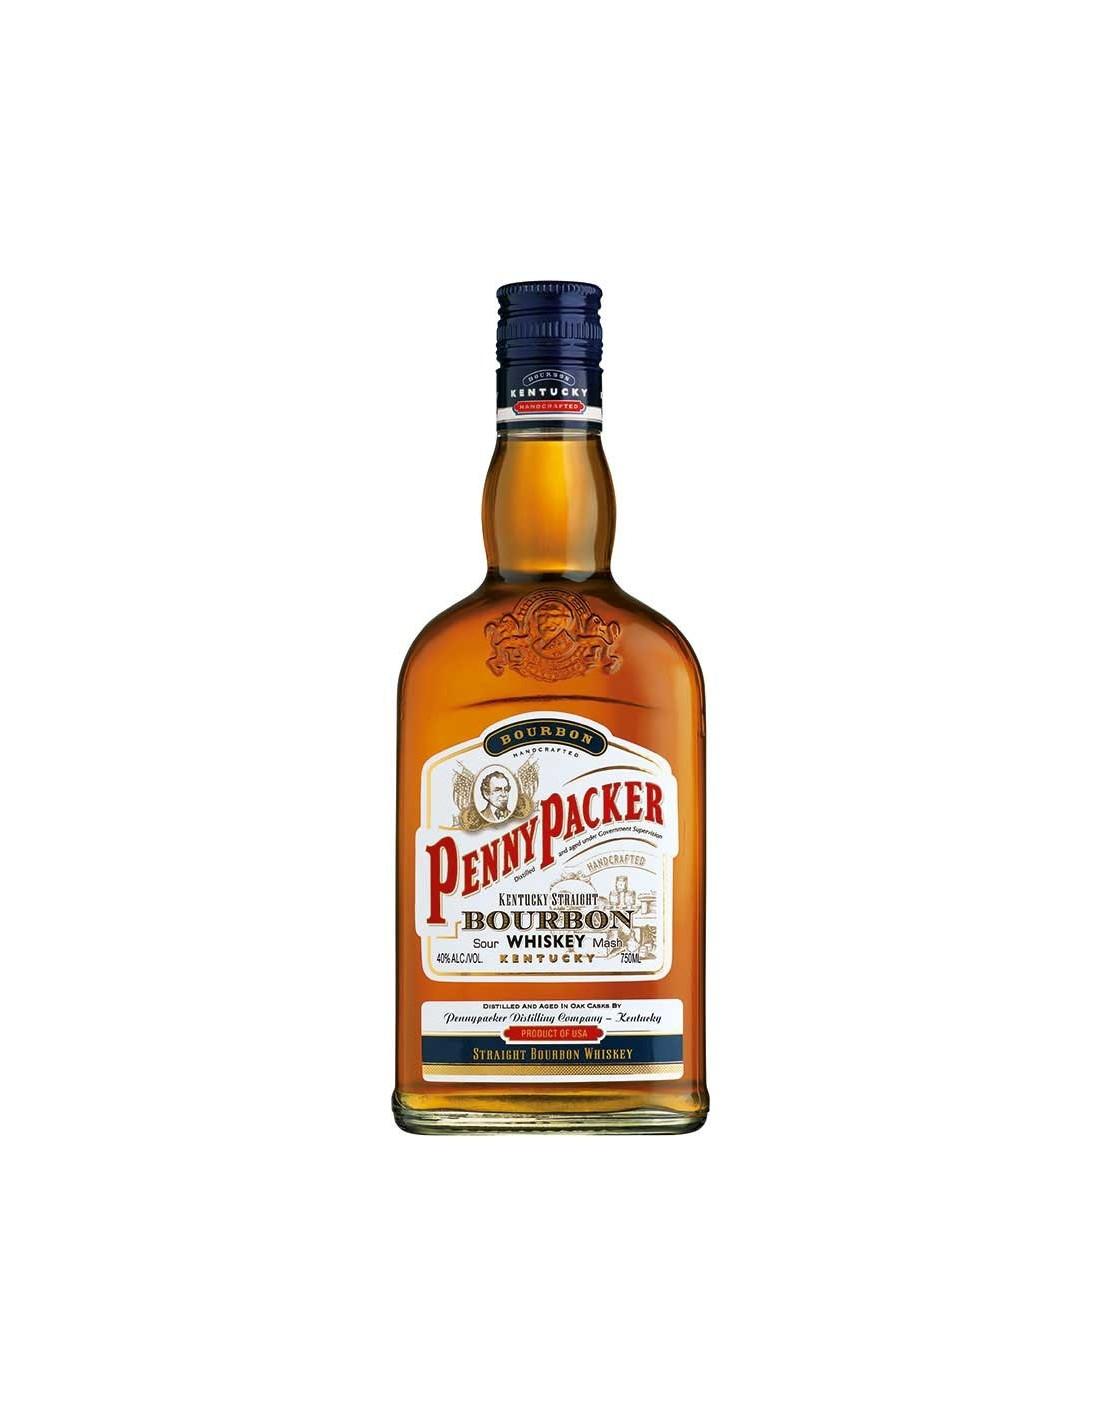 Whisky Bourbon PennyPacker, 40% alc., 0.7L, America